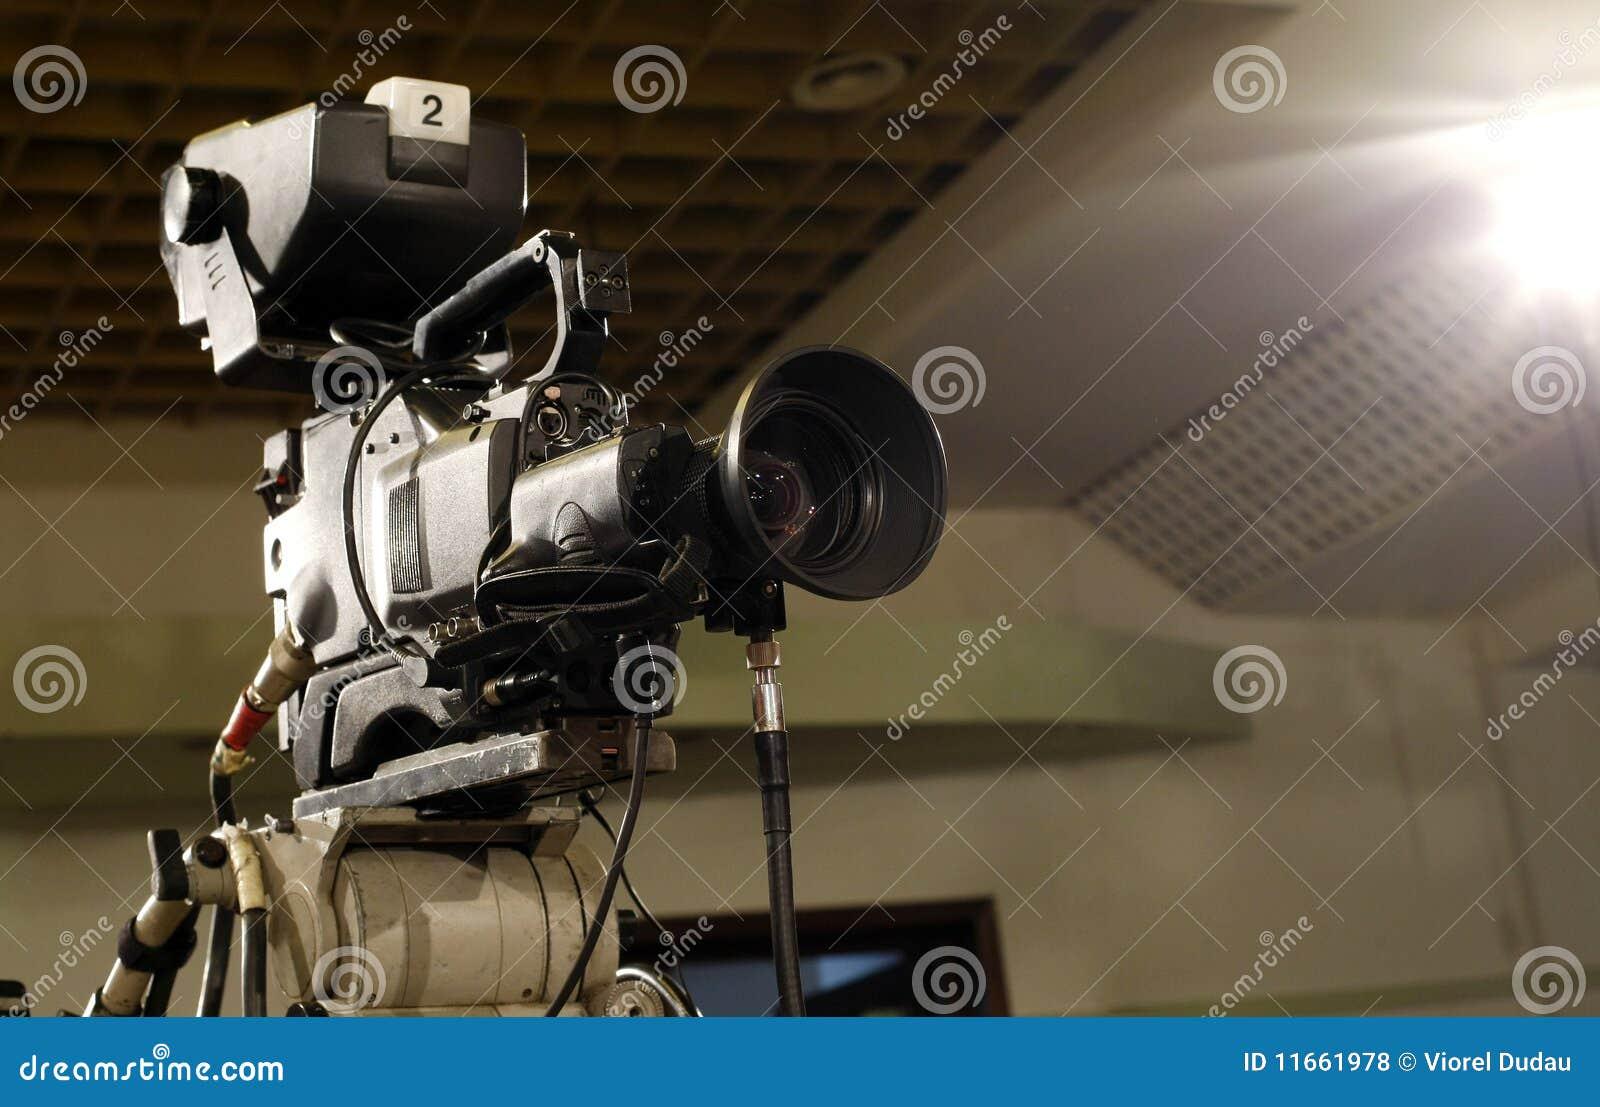 Kameratelevision